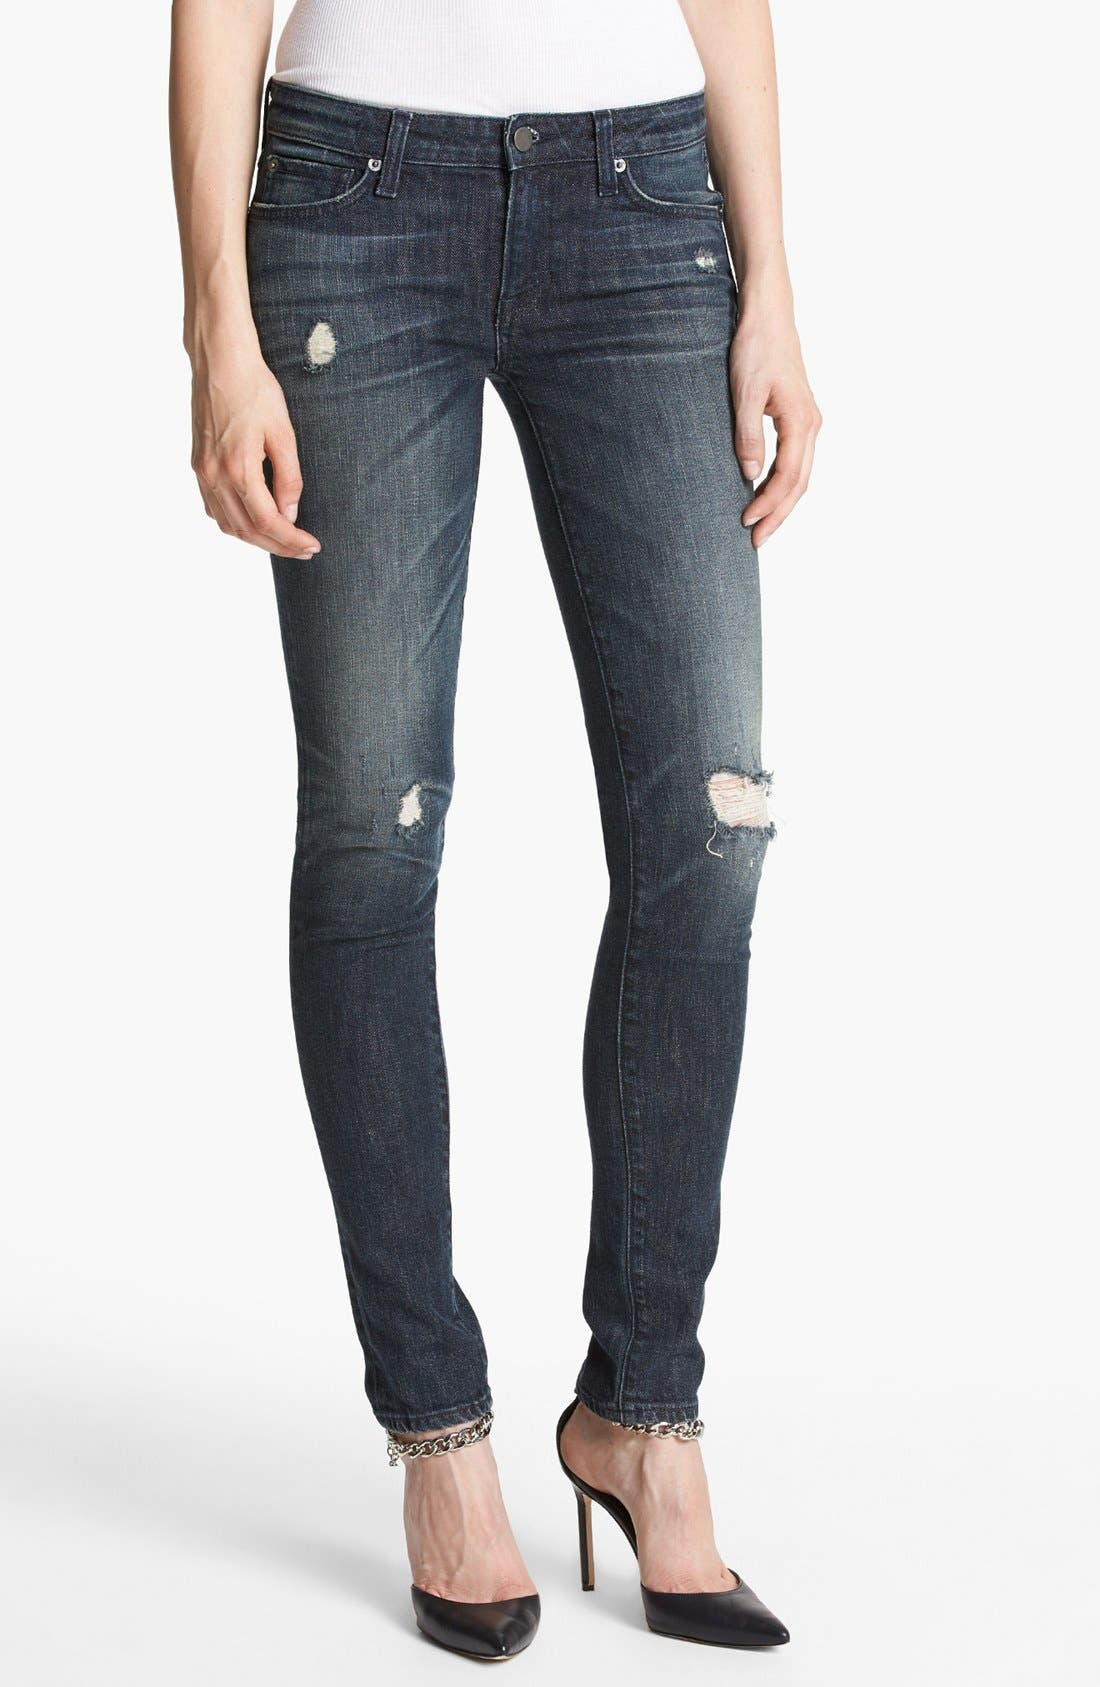 Main Image - TEXTILE Elizabeth and James 'Kate' Skinny Jeans